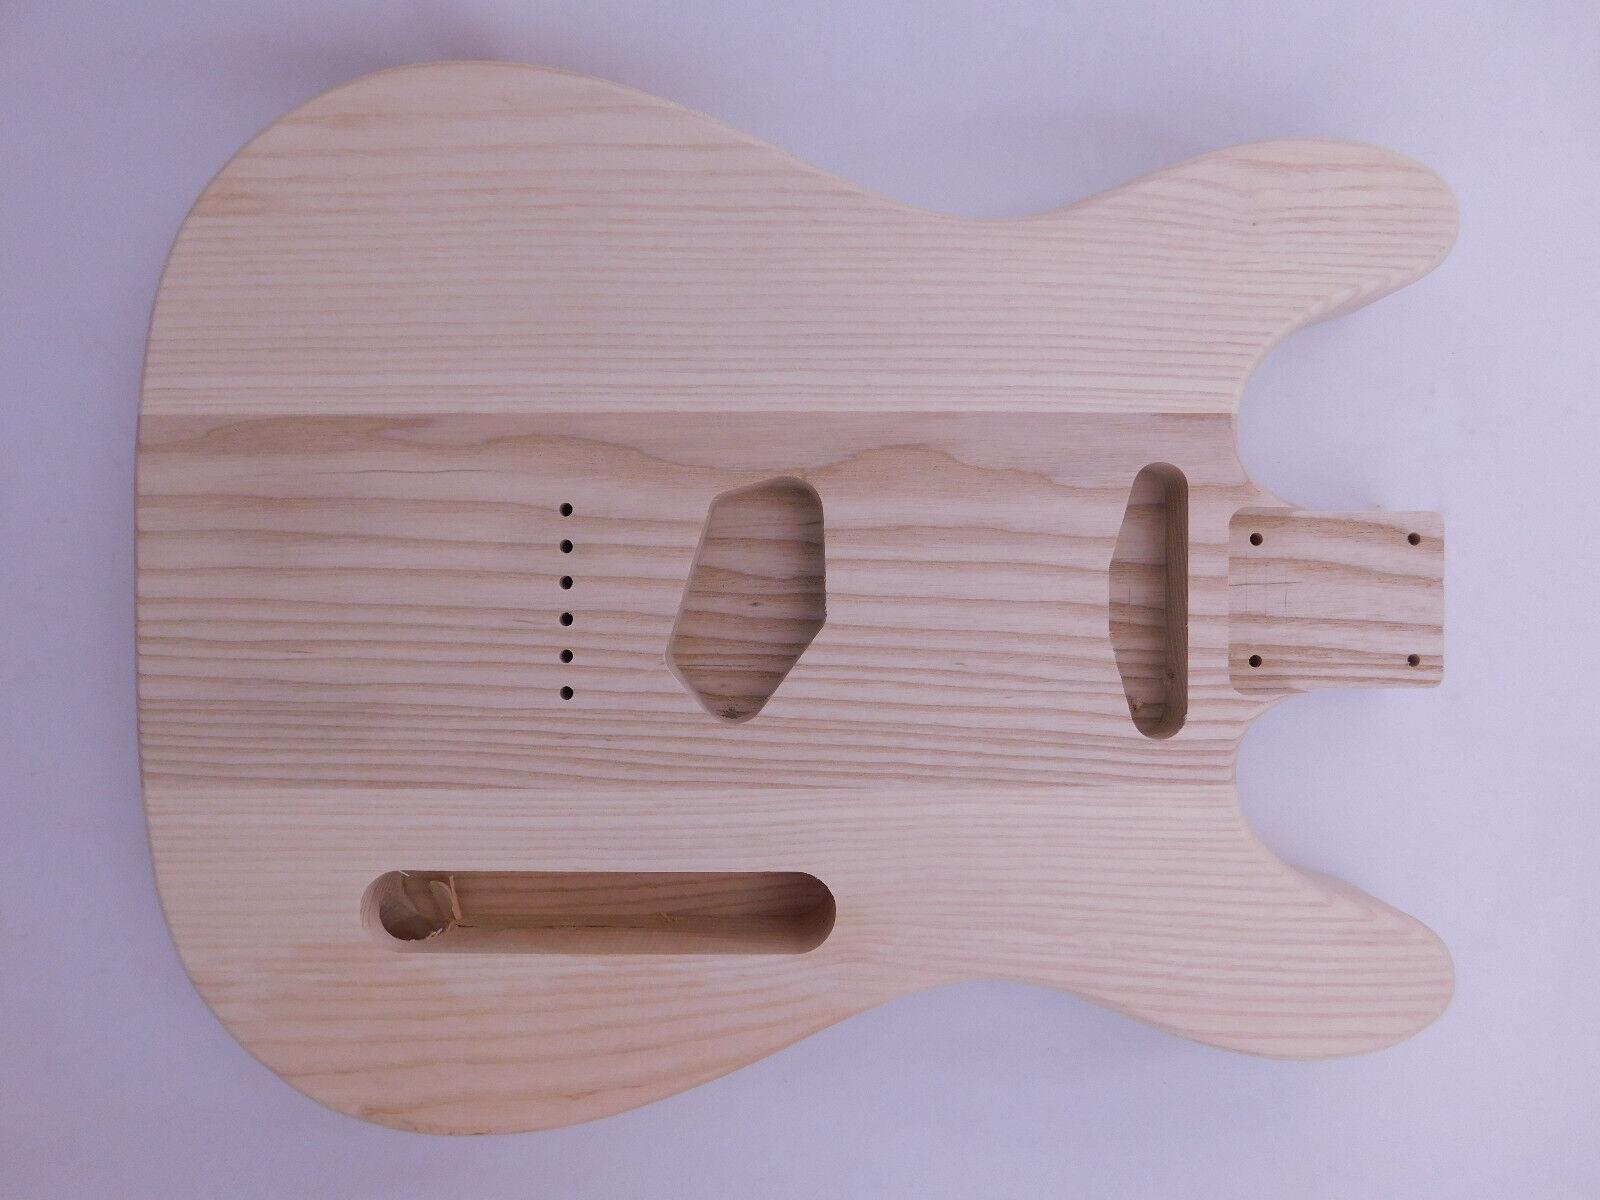 Ash T-Style Guitar Body Double-Cut